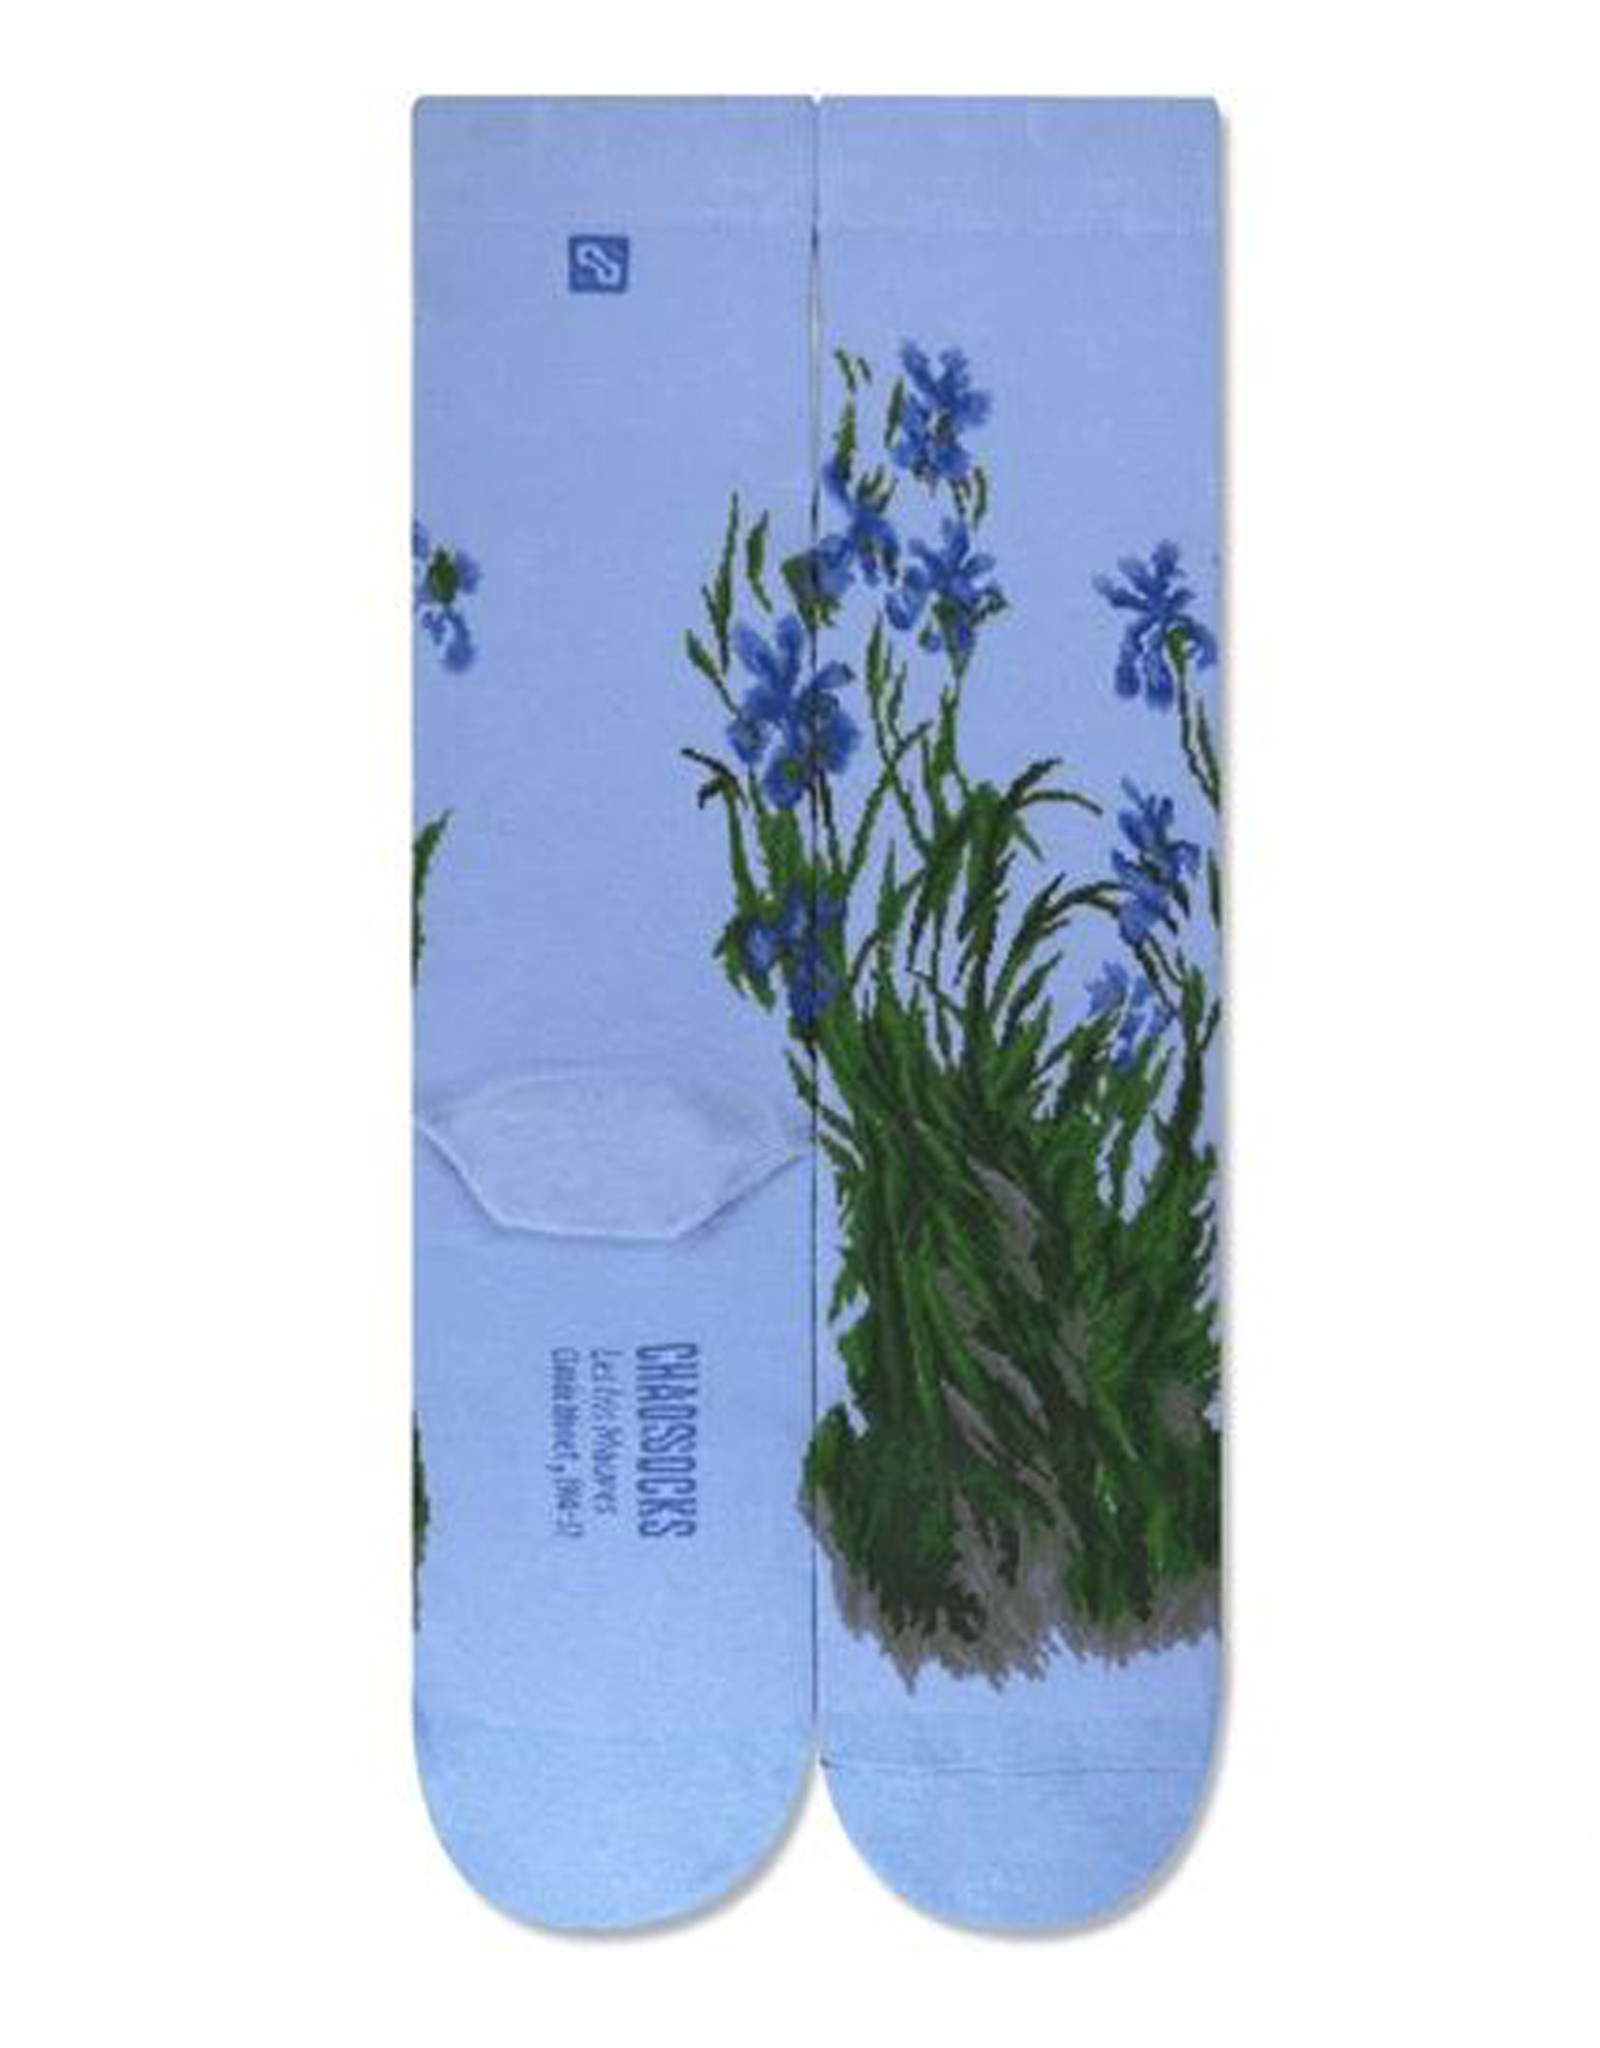 Les Iris Mauves Socks